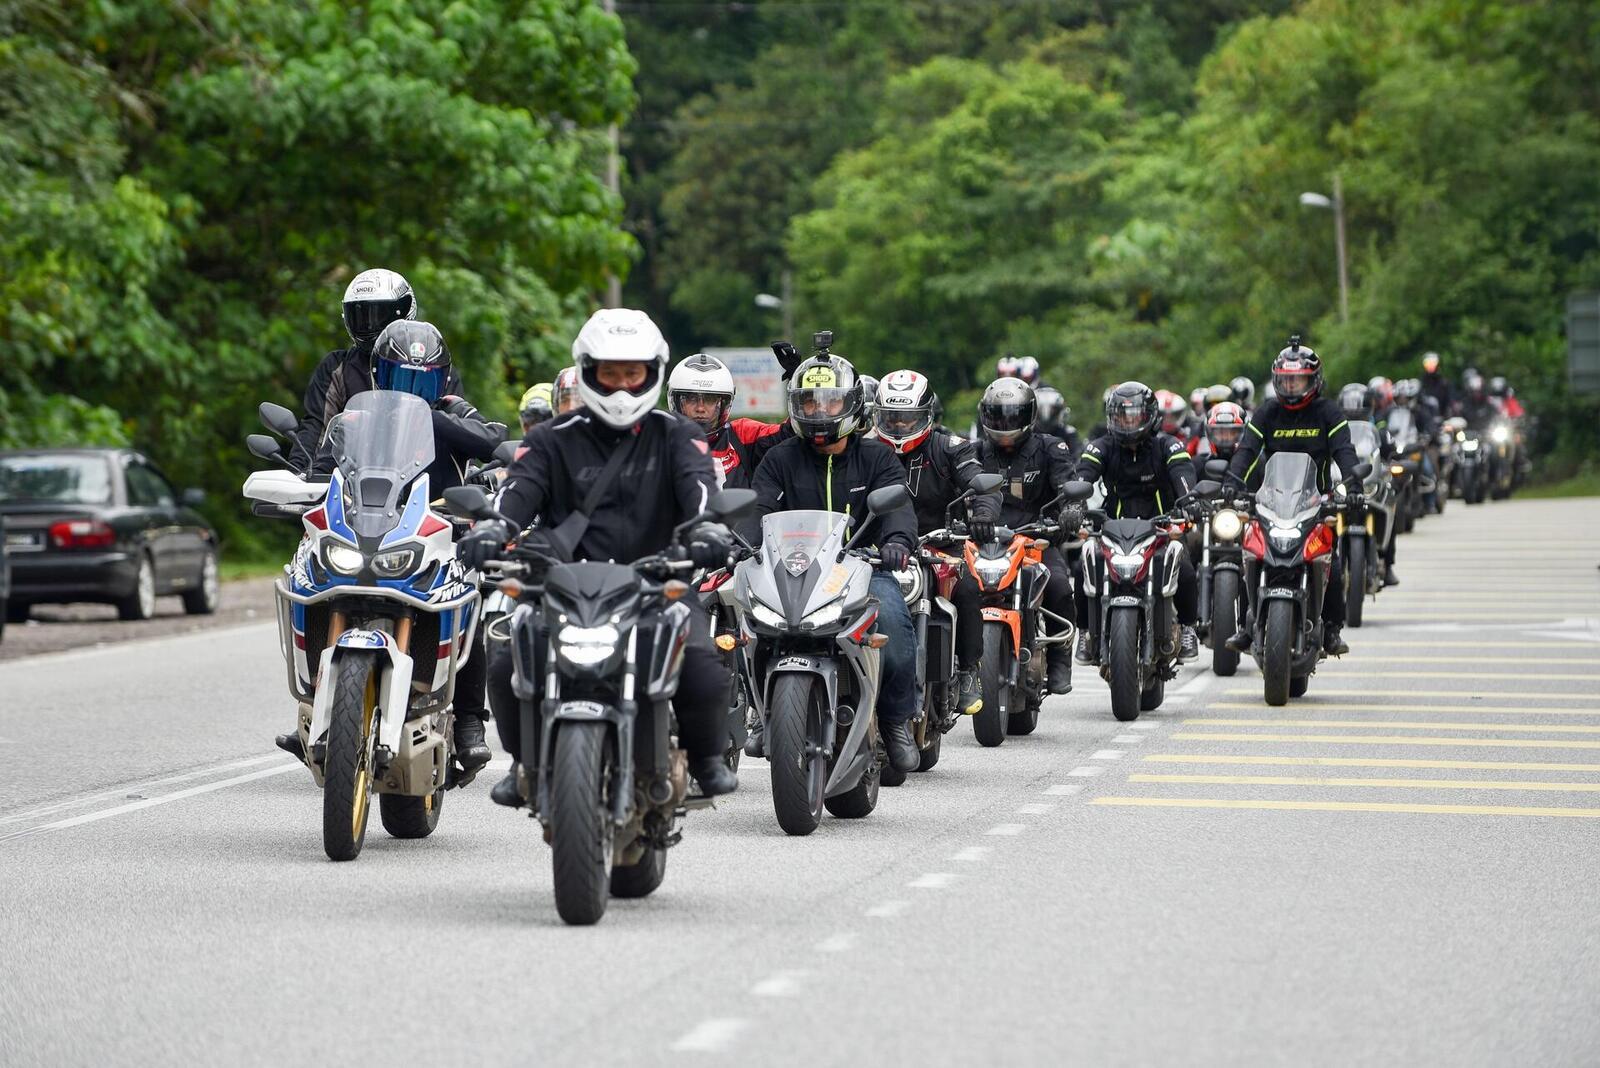 honda-asian-journey-2019-hanh-trinh-cua-dam-me-toc-do-va-chinh-phuc-thu-thach